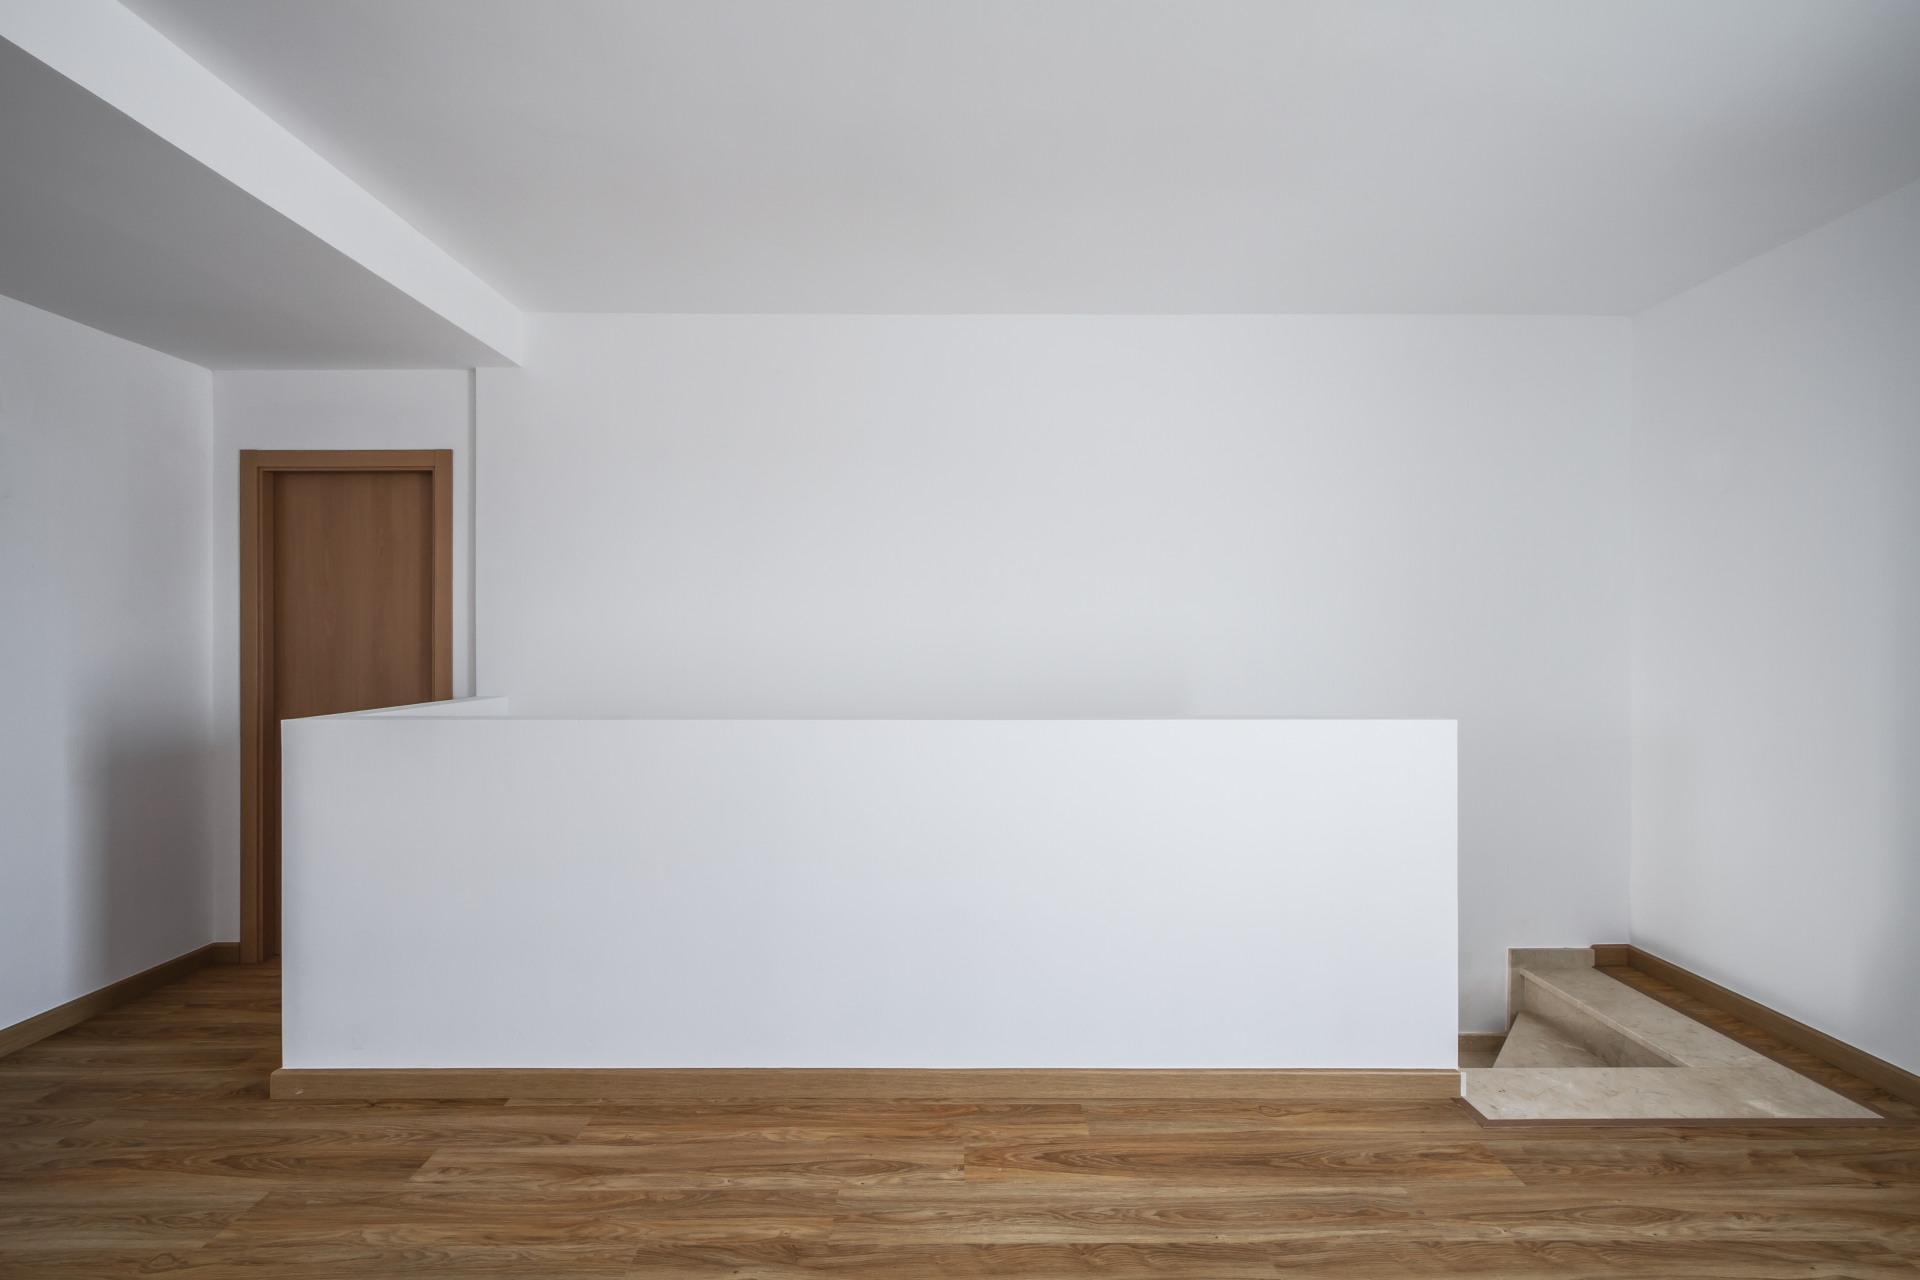 fotografia-arquitectura-valencia-german-cabo-viraje-sagunto (16)